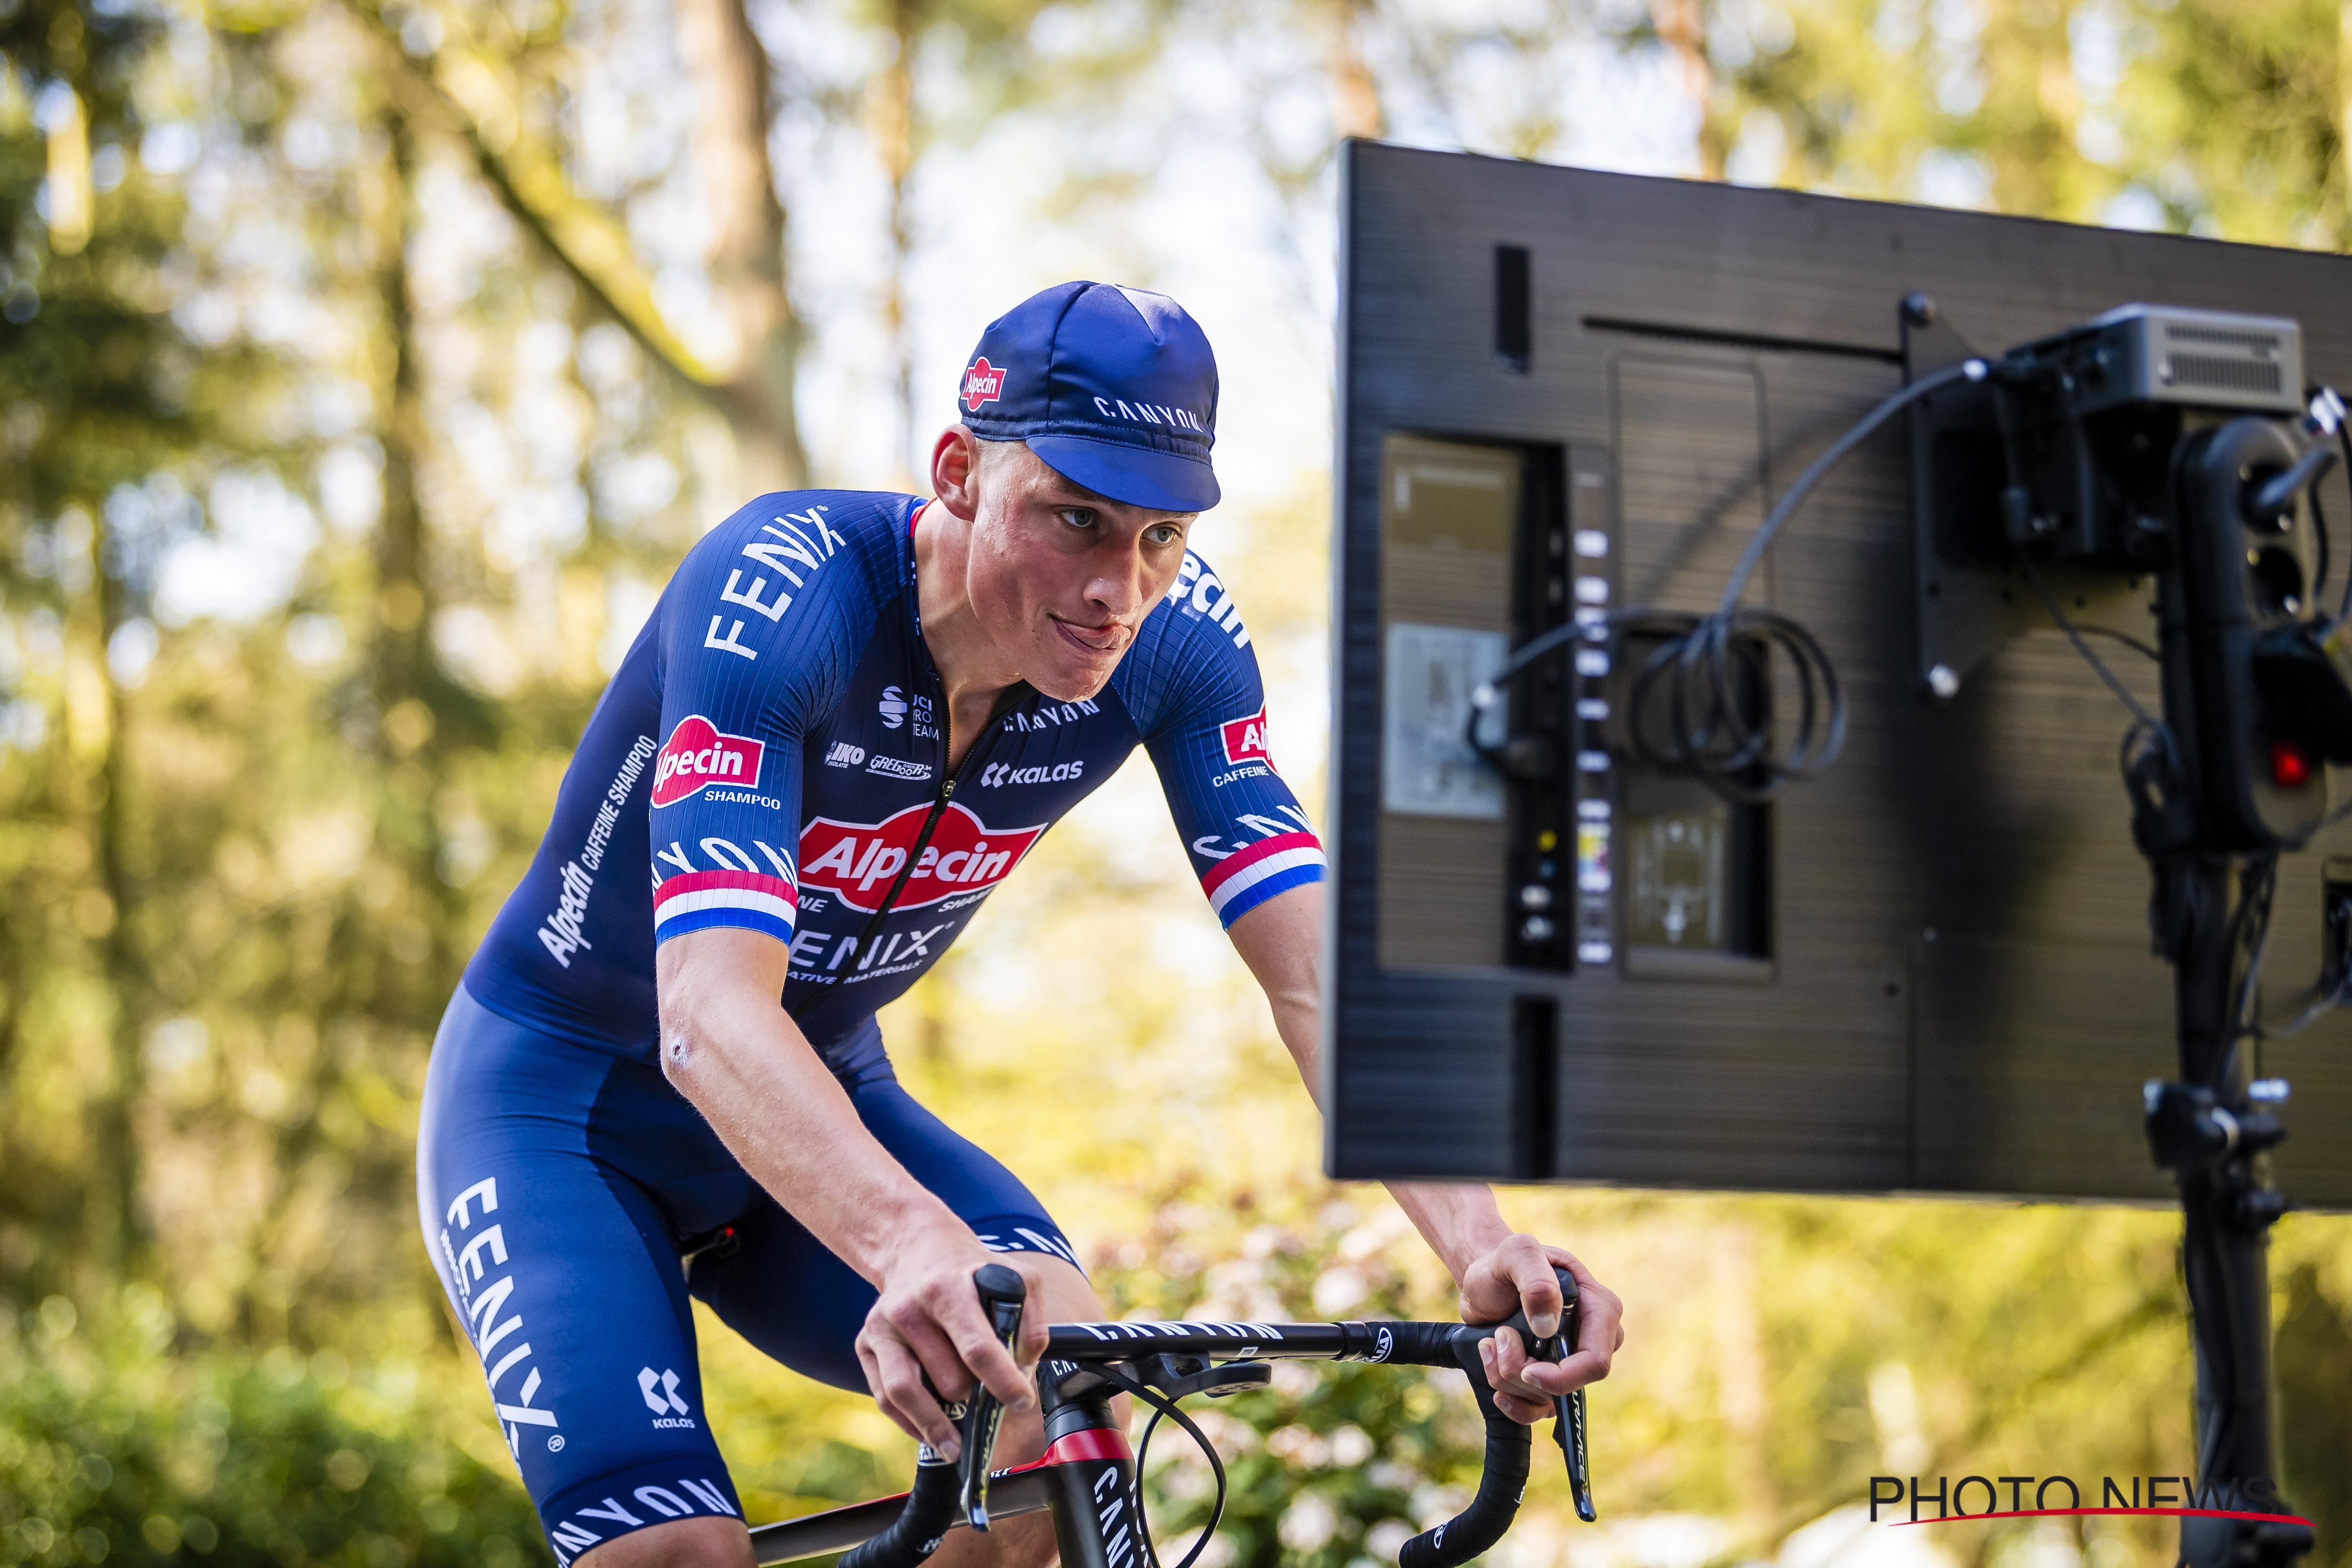 Van Der Poel and the Zwift Protocol